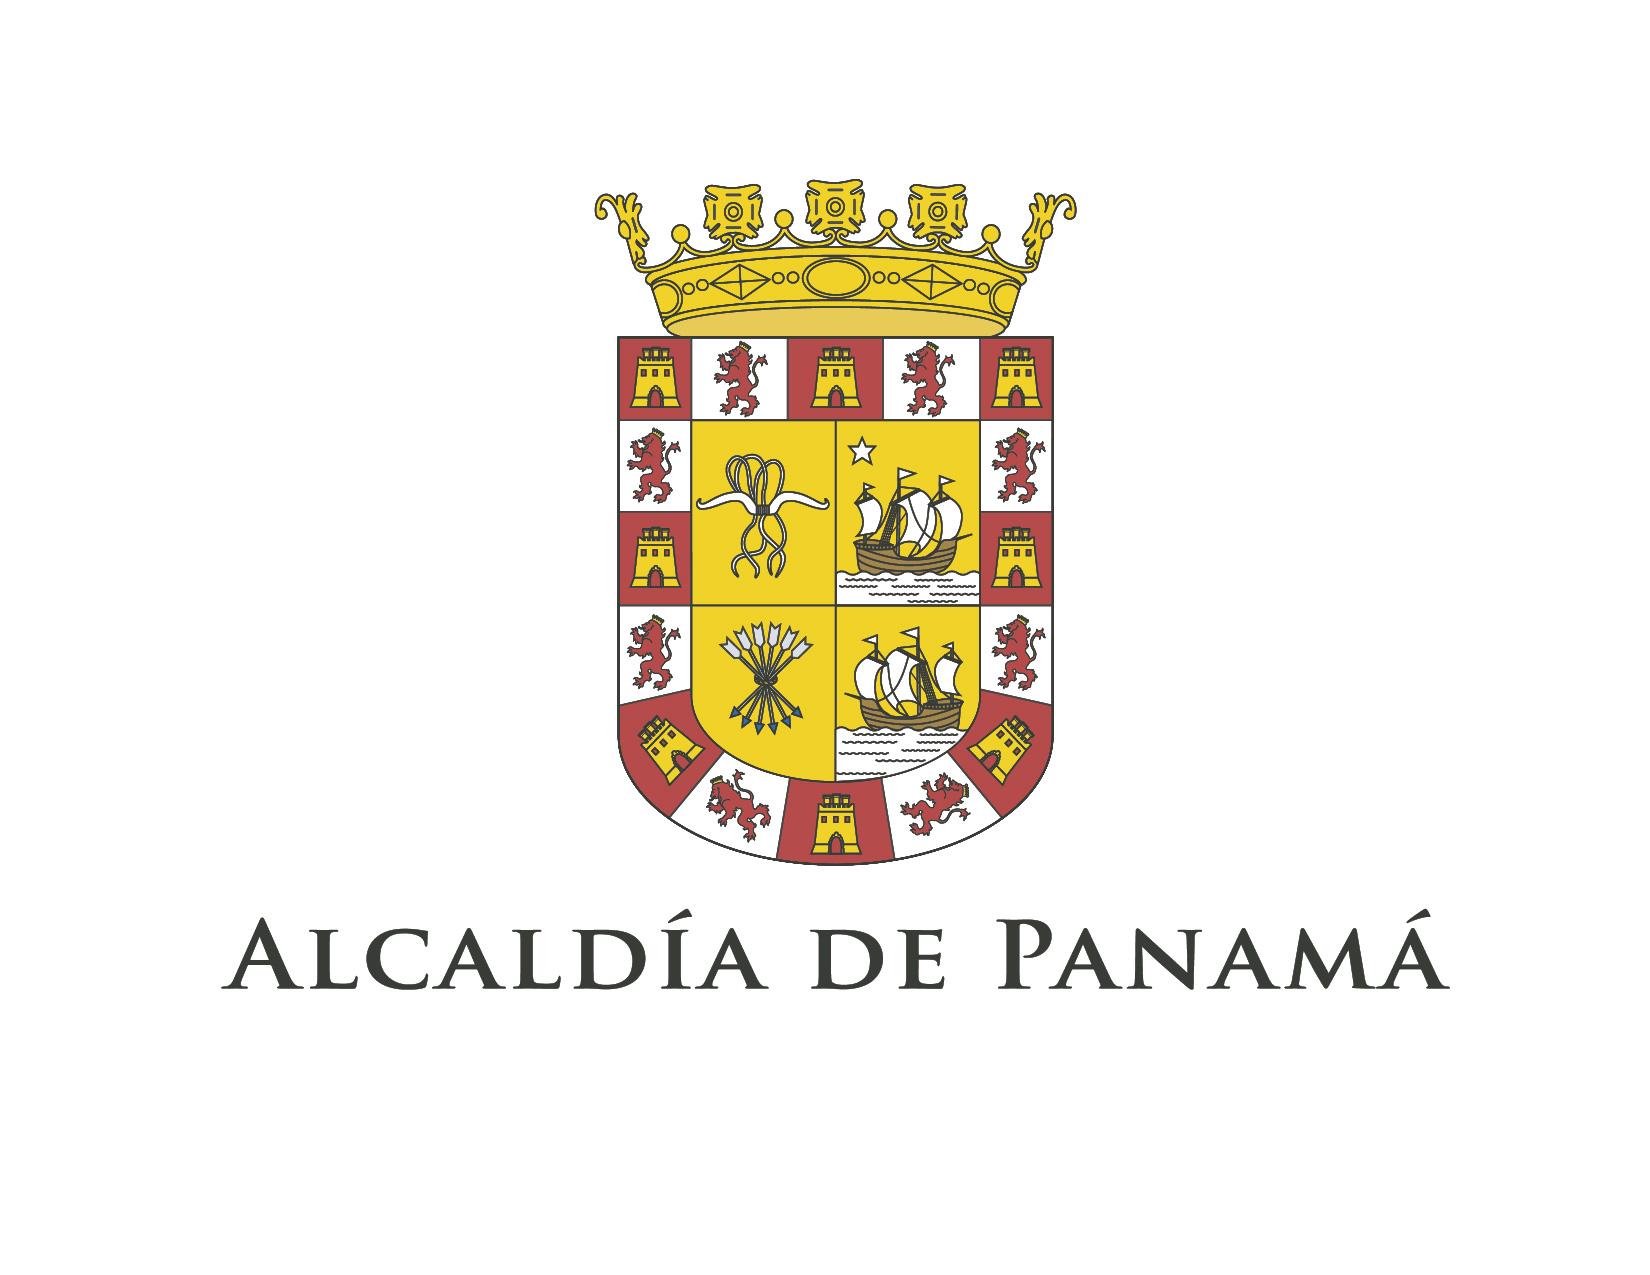 Alcaldía de Panamá